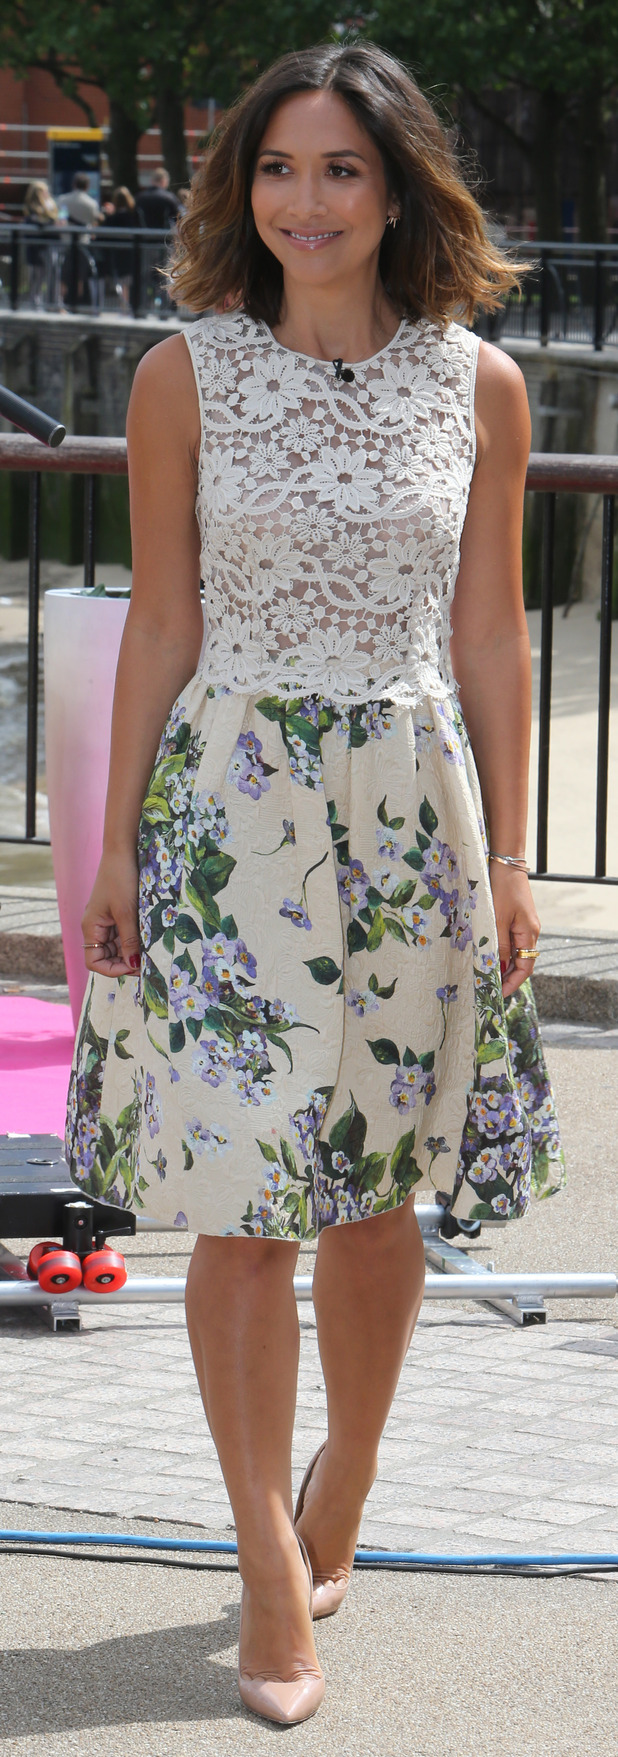 Myleene Klass filming BBQ Champ outside ITV studios, London Southbank 30th July 2015